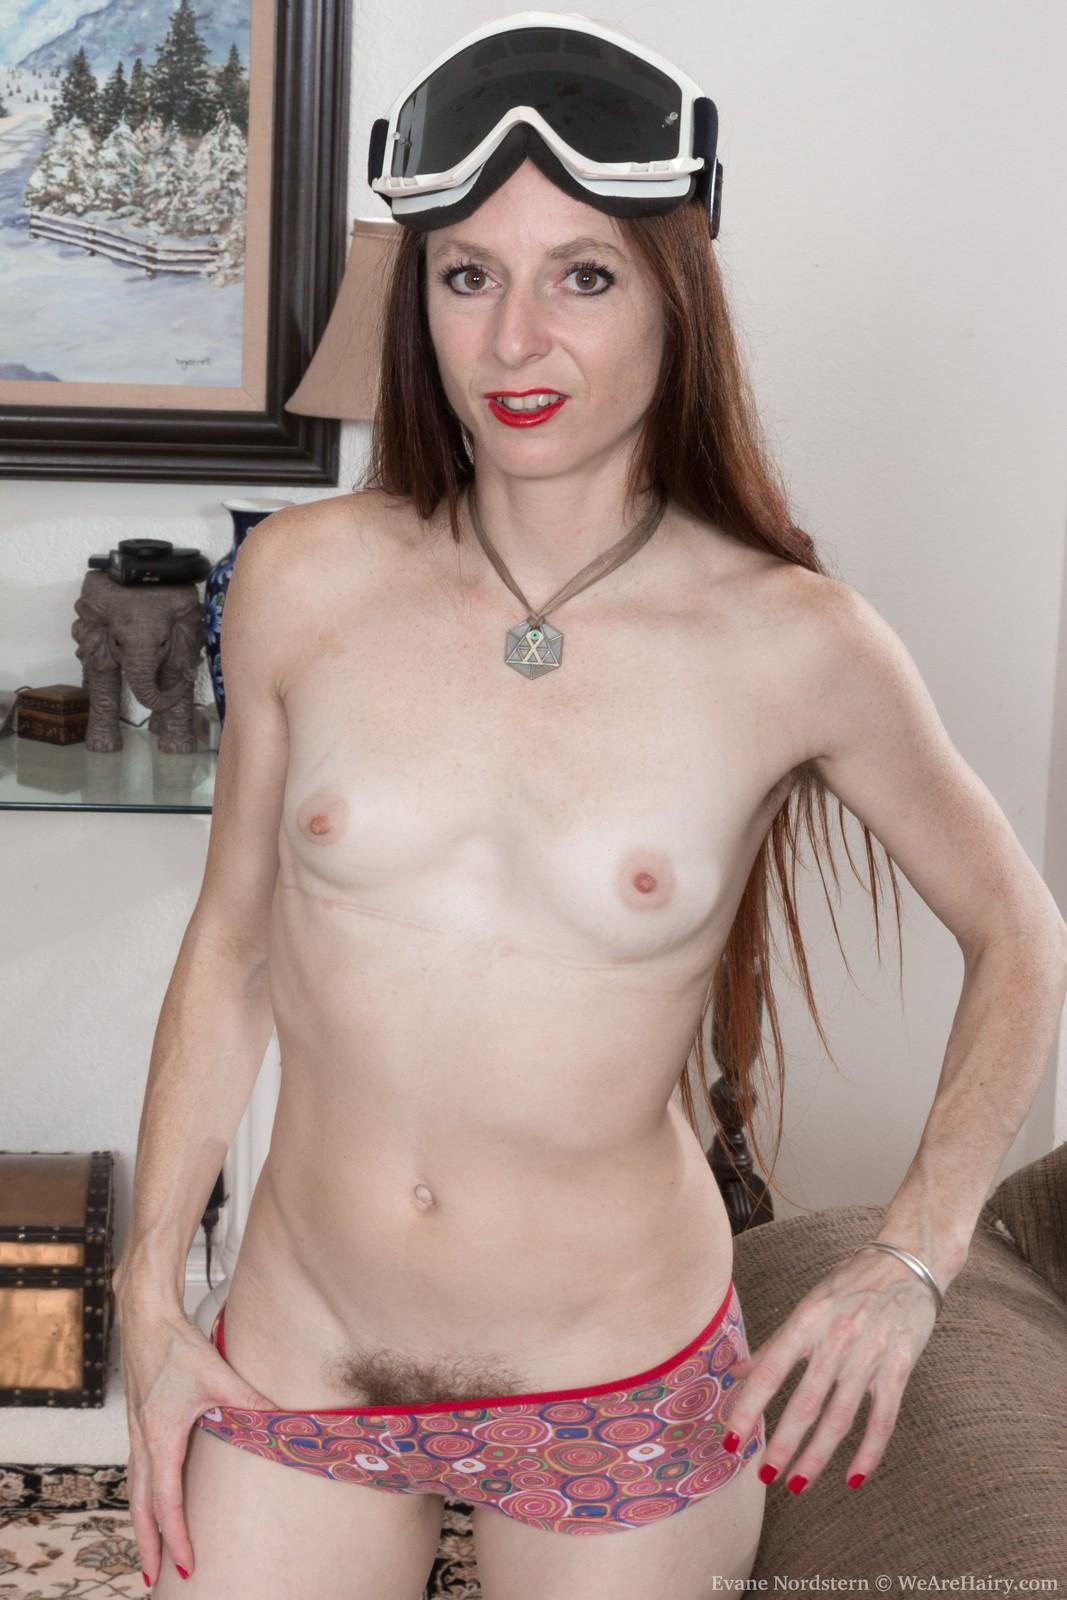 evane-nordstern-strips-naked-in-her-living-room7.jpg